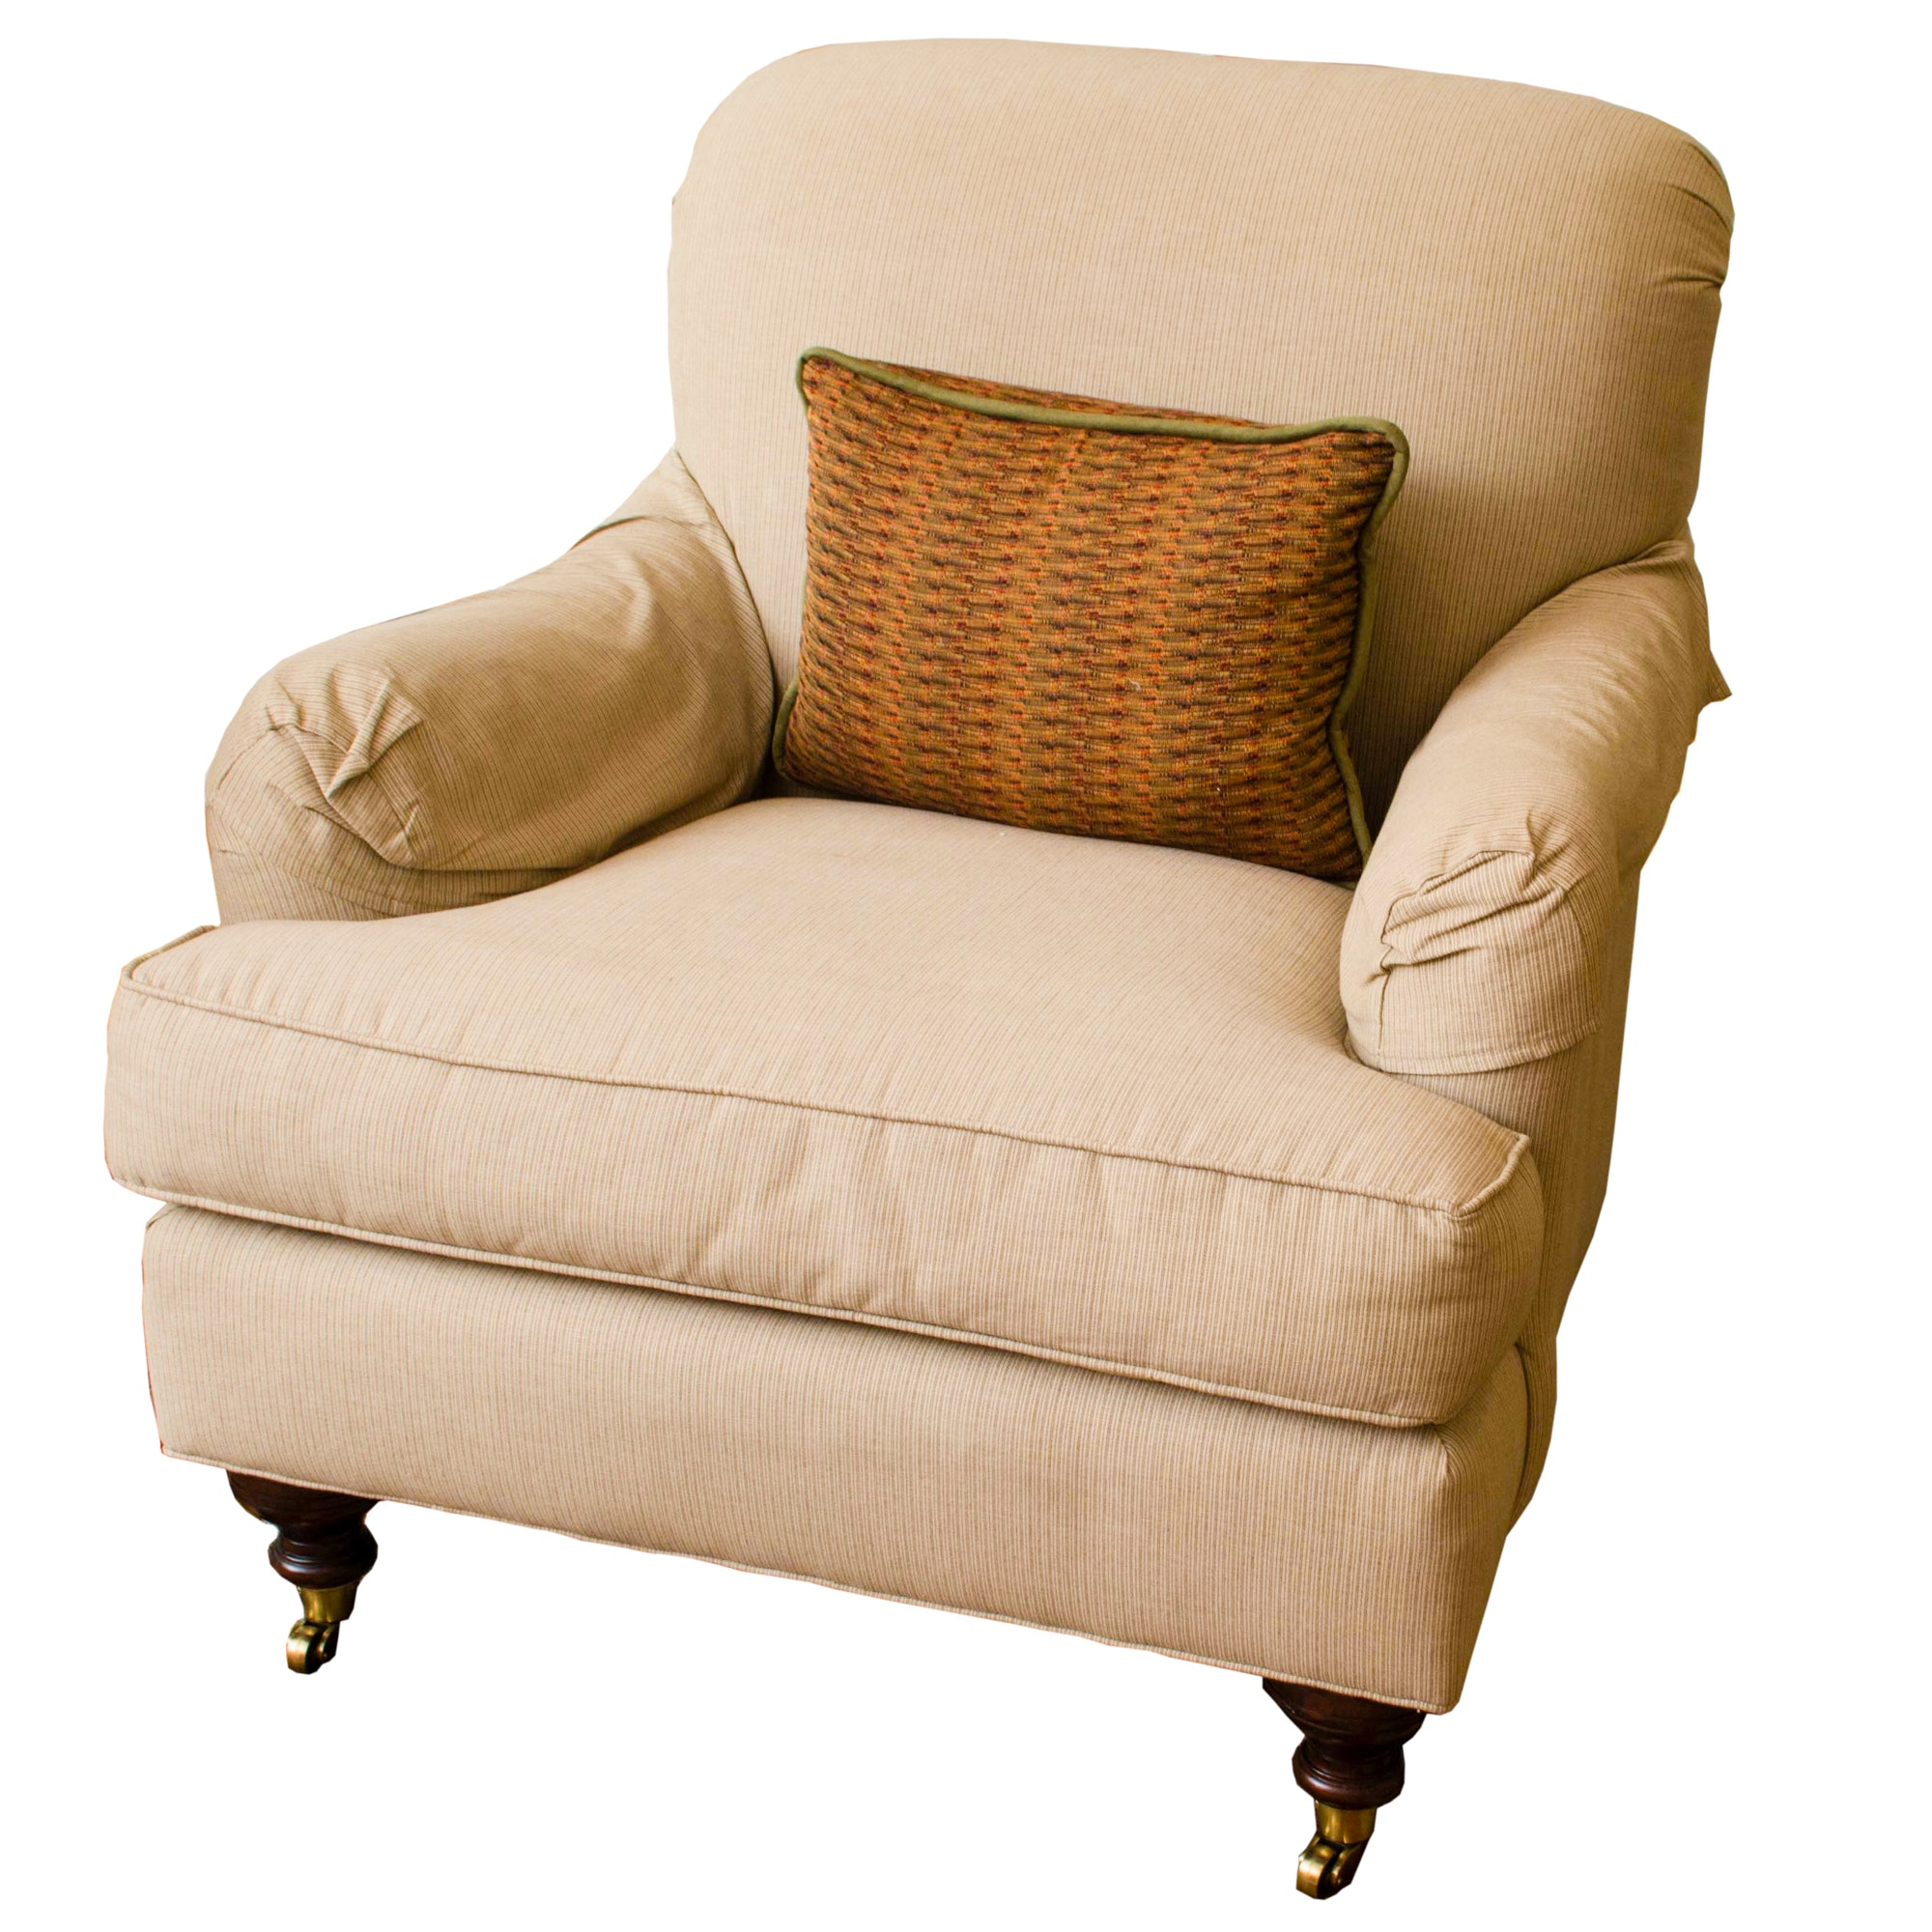 Drexel Heritage Turned Leg Club Chair